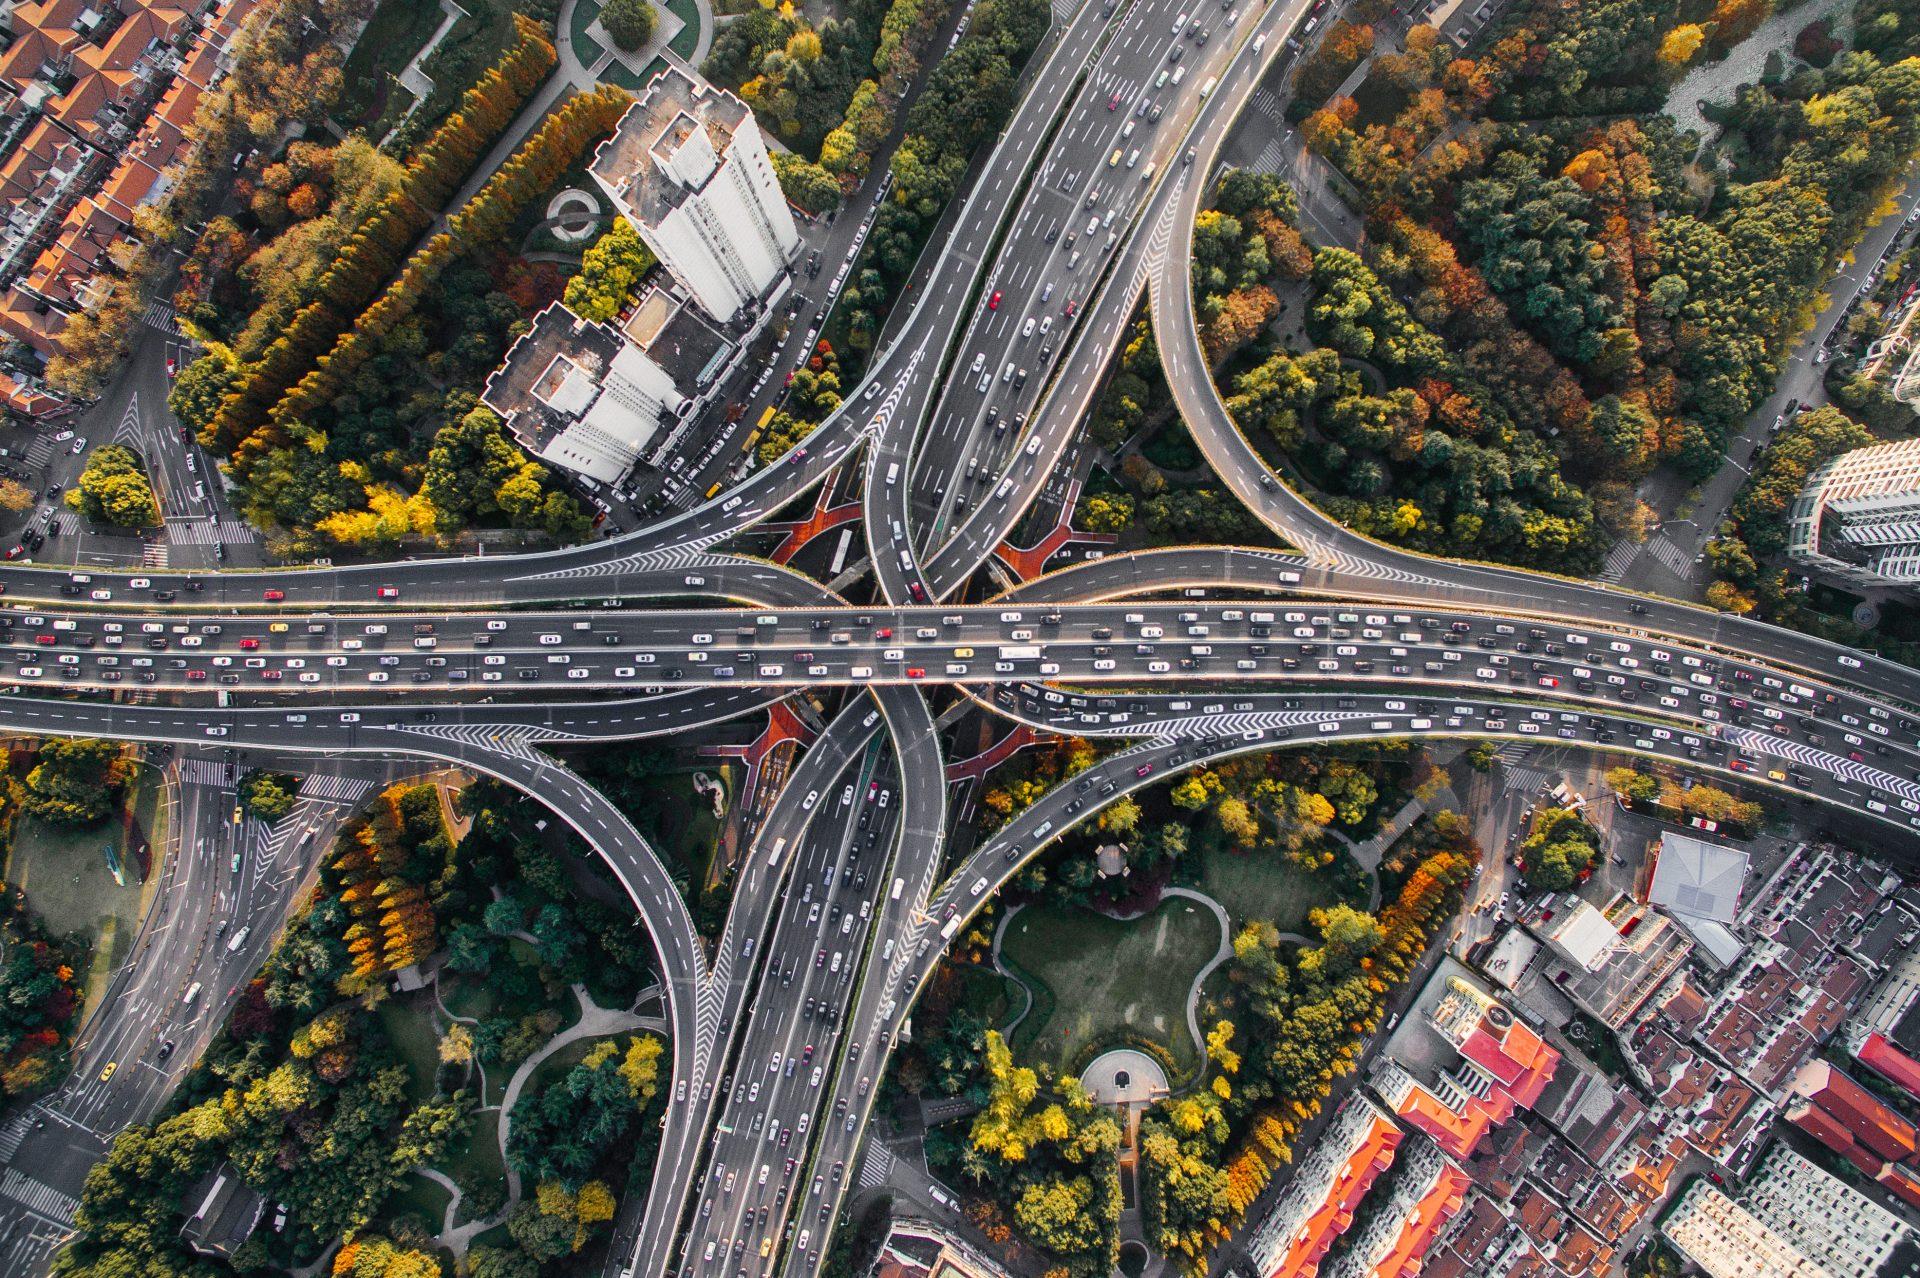 Traffic in urban areas